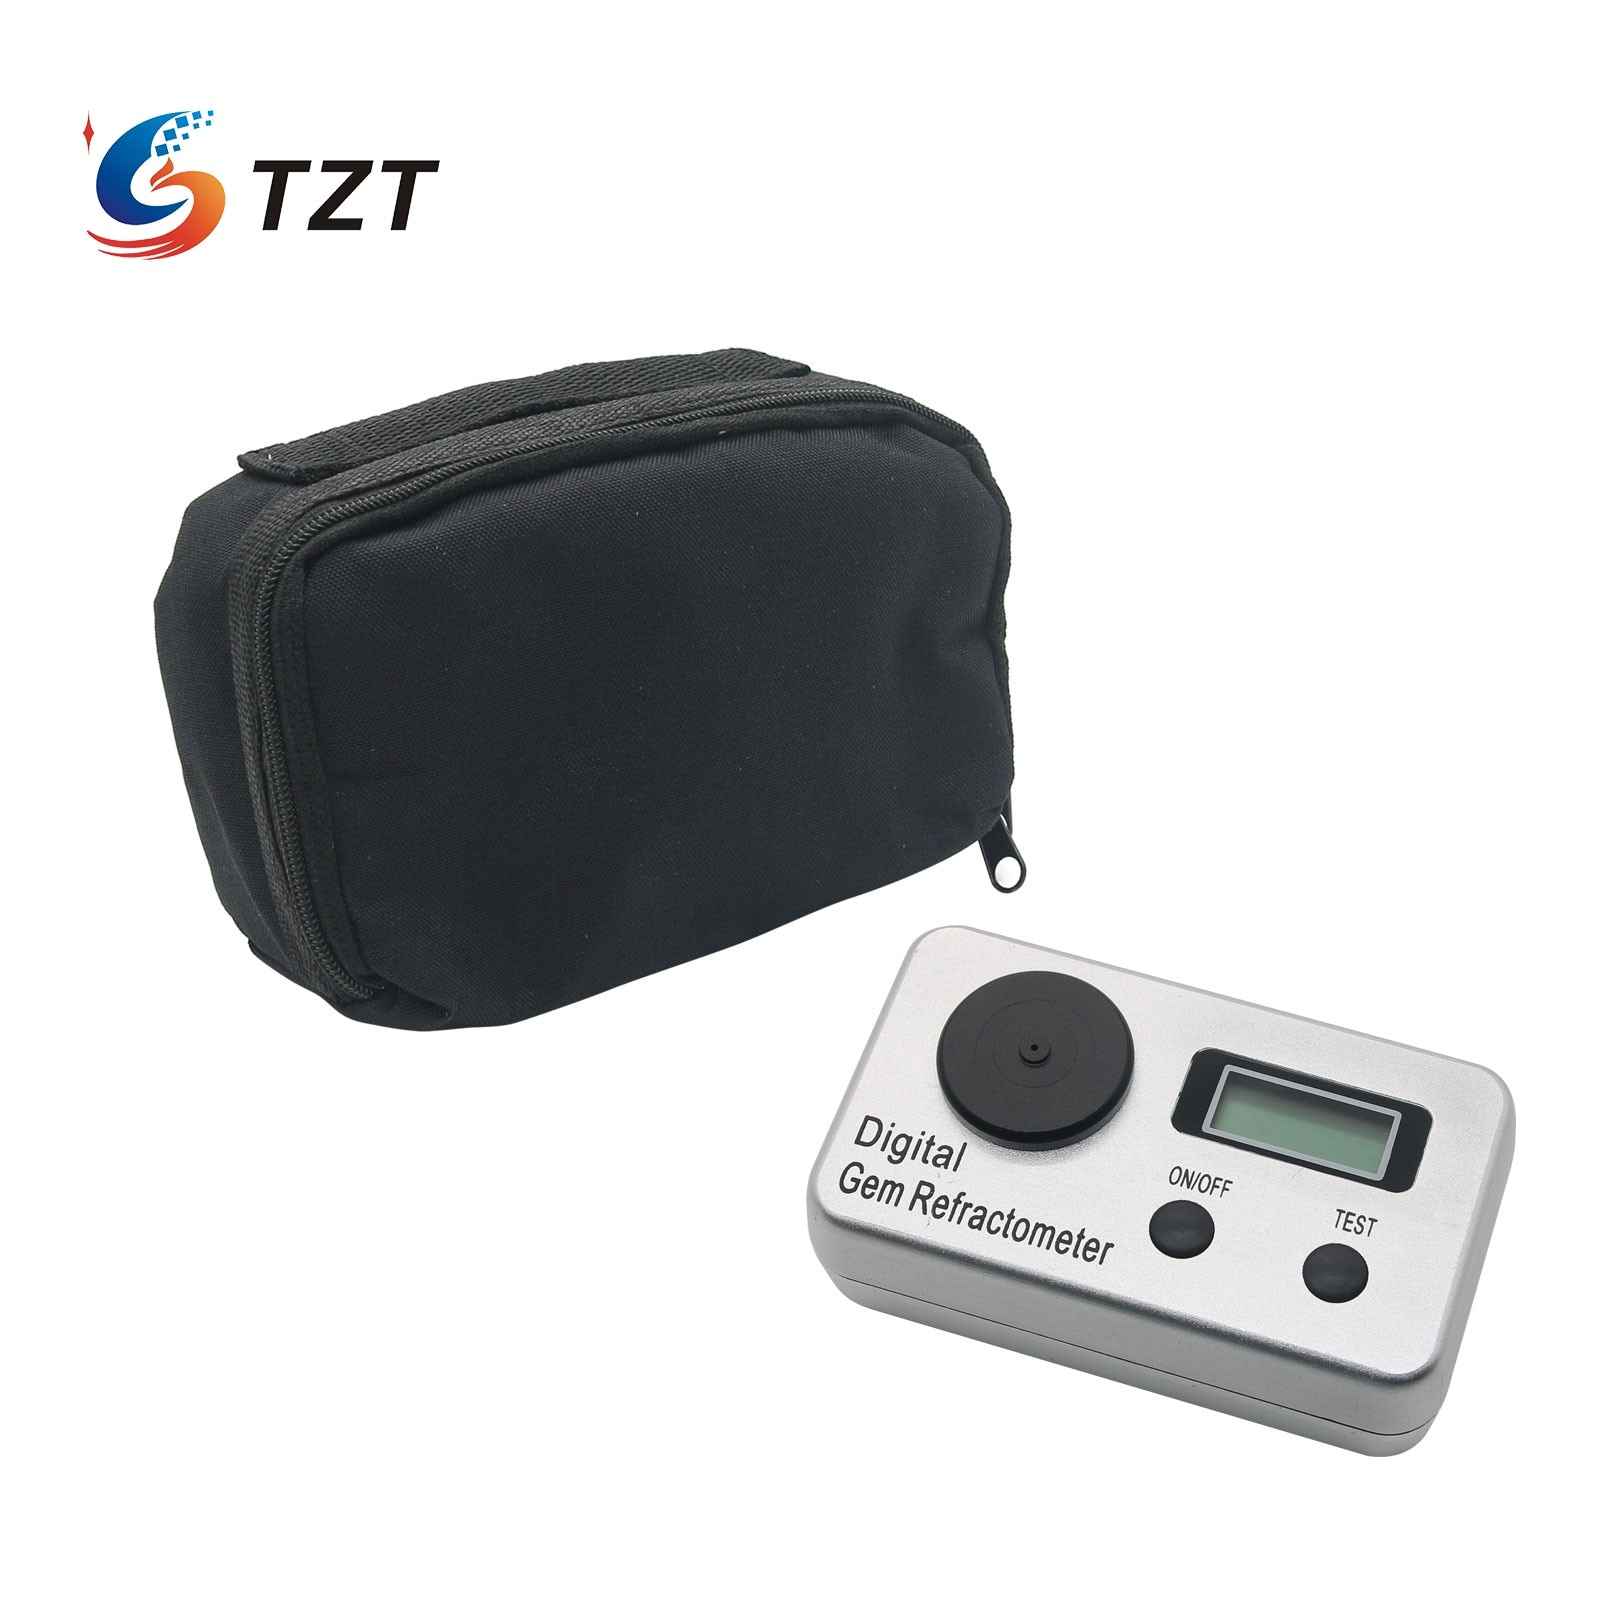 TZT 1.4-2.0 ري الأحجار الكريمة والأحجار الكريمة أداة الأحجار الكريمة الرقمية إنكسار الأحجار الكريمة